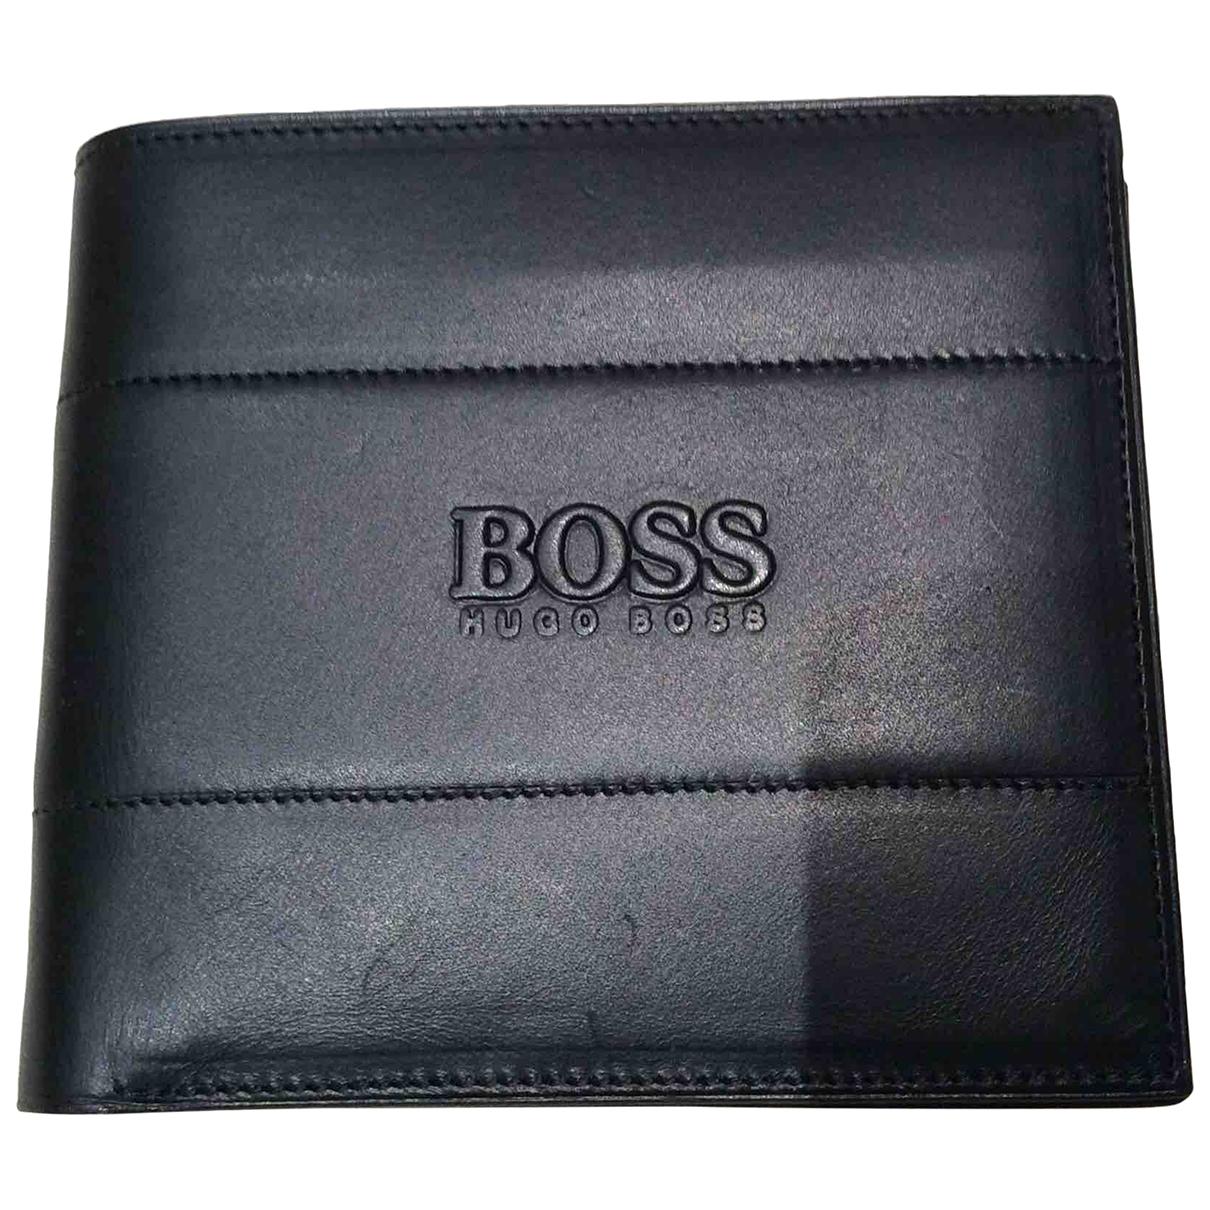 Marroquineria de Cuero Boss